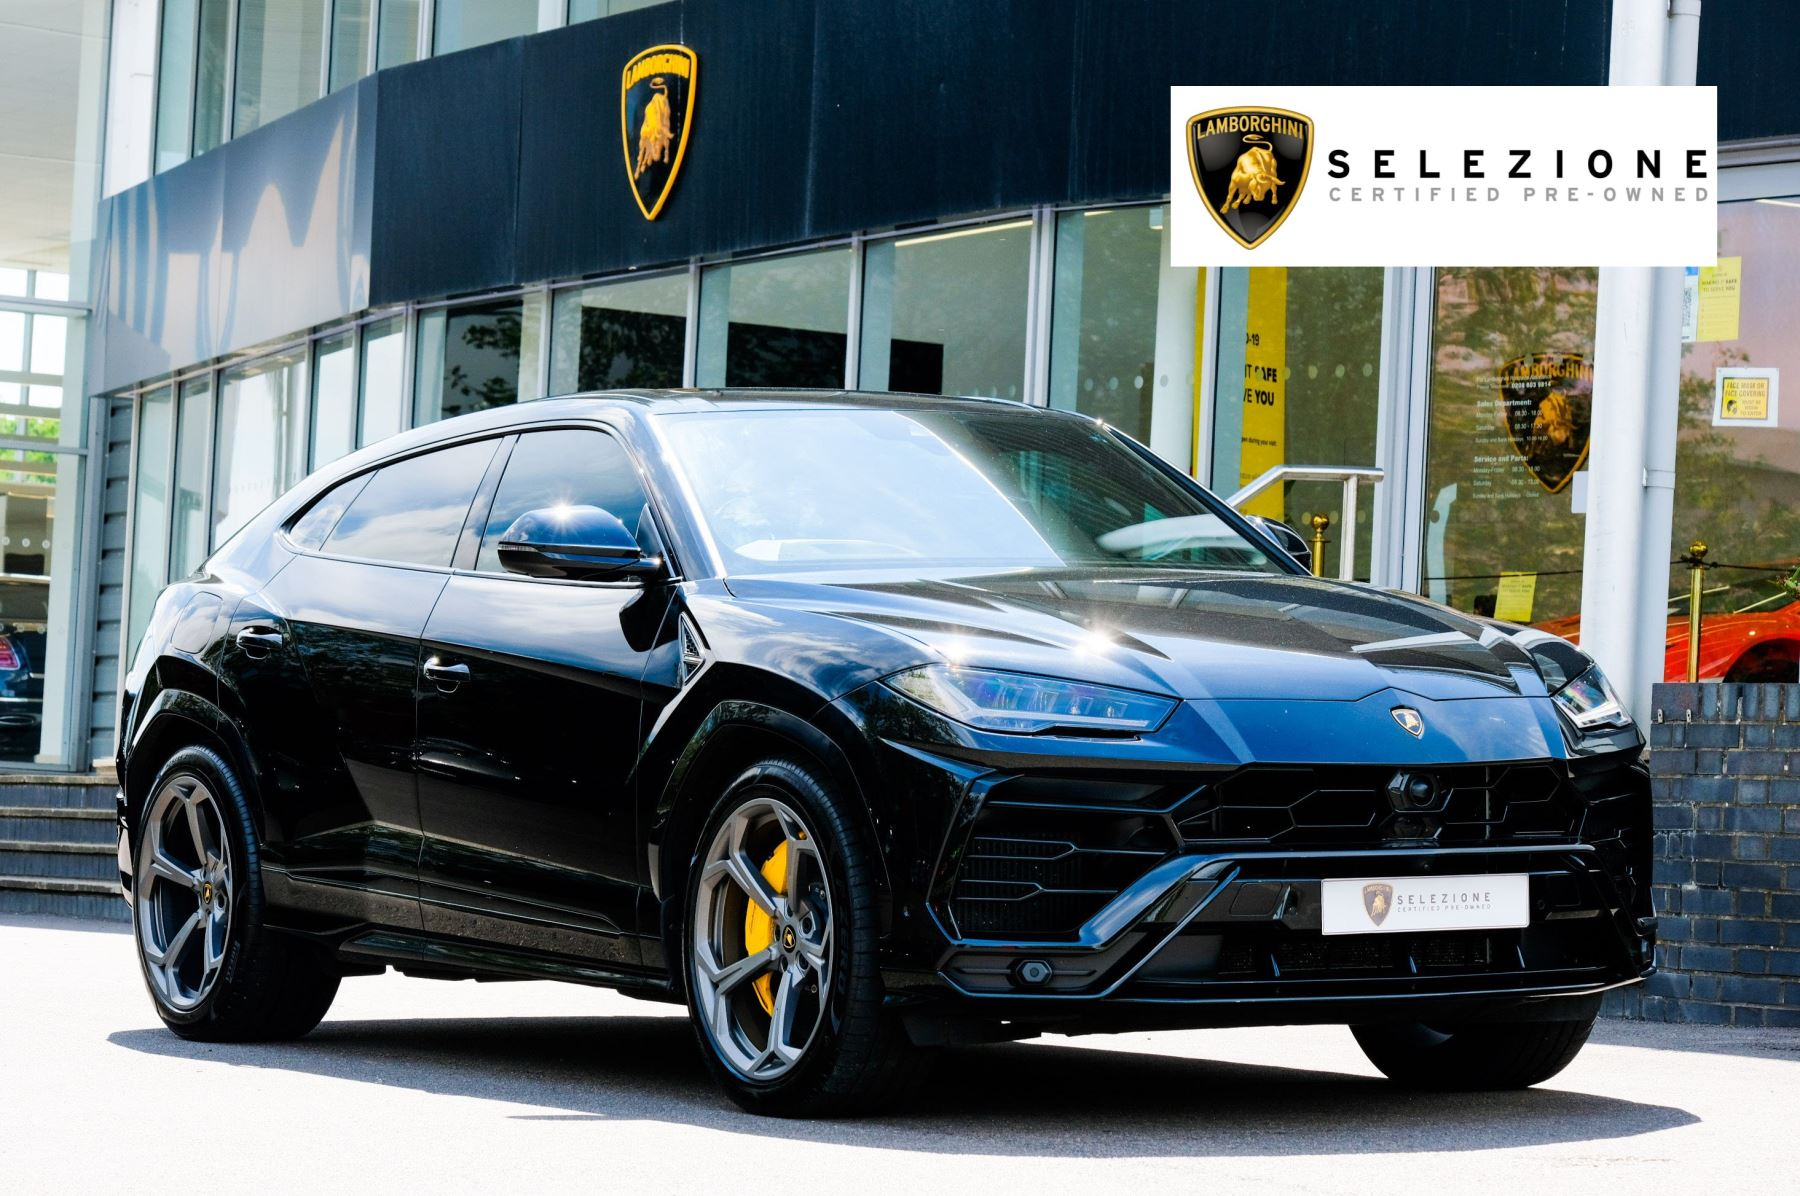 Lamborghini Urus 4.0T FSI V8 5dr Auto - Akrapovic Racing Exhaust - Rear Seat Entertainment Automatic Estate